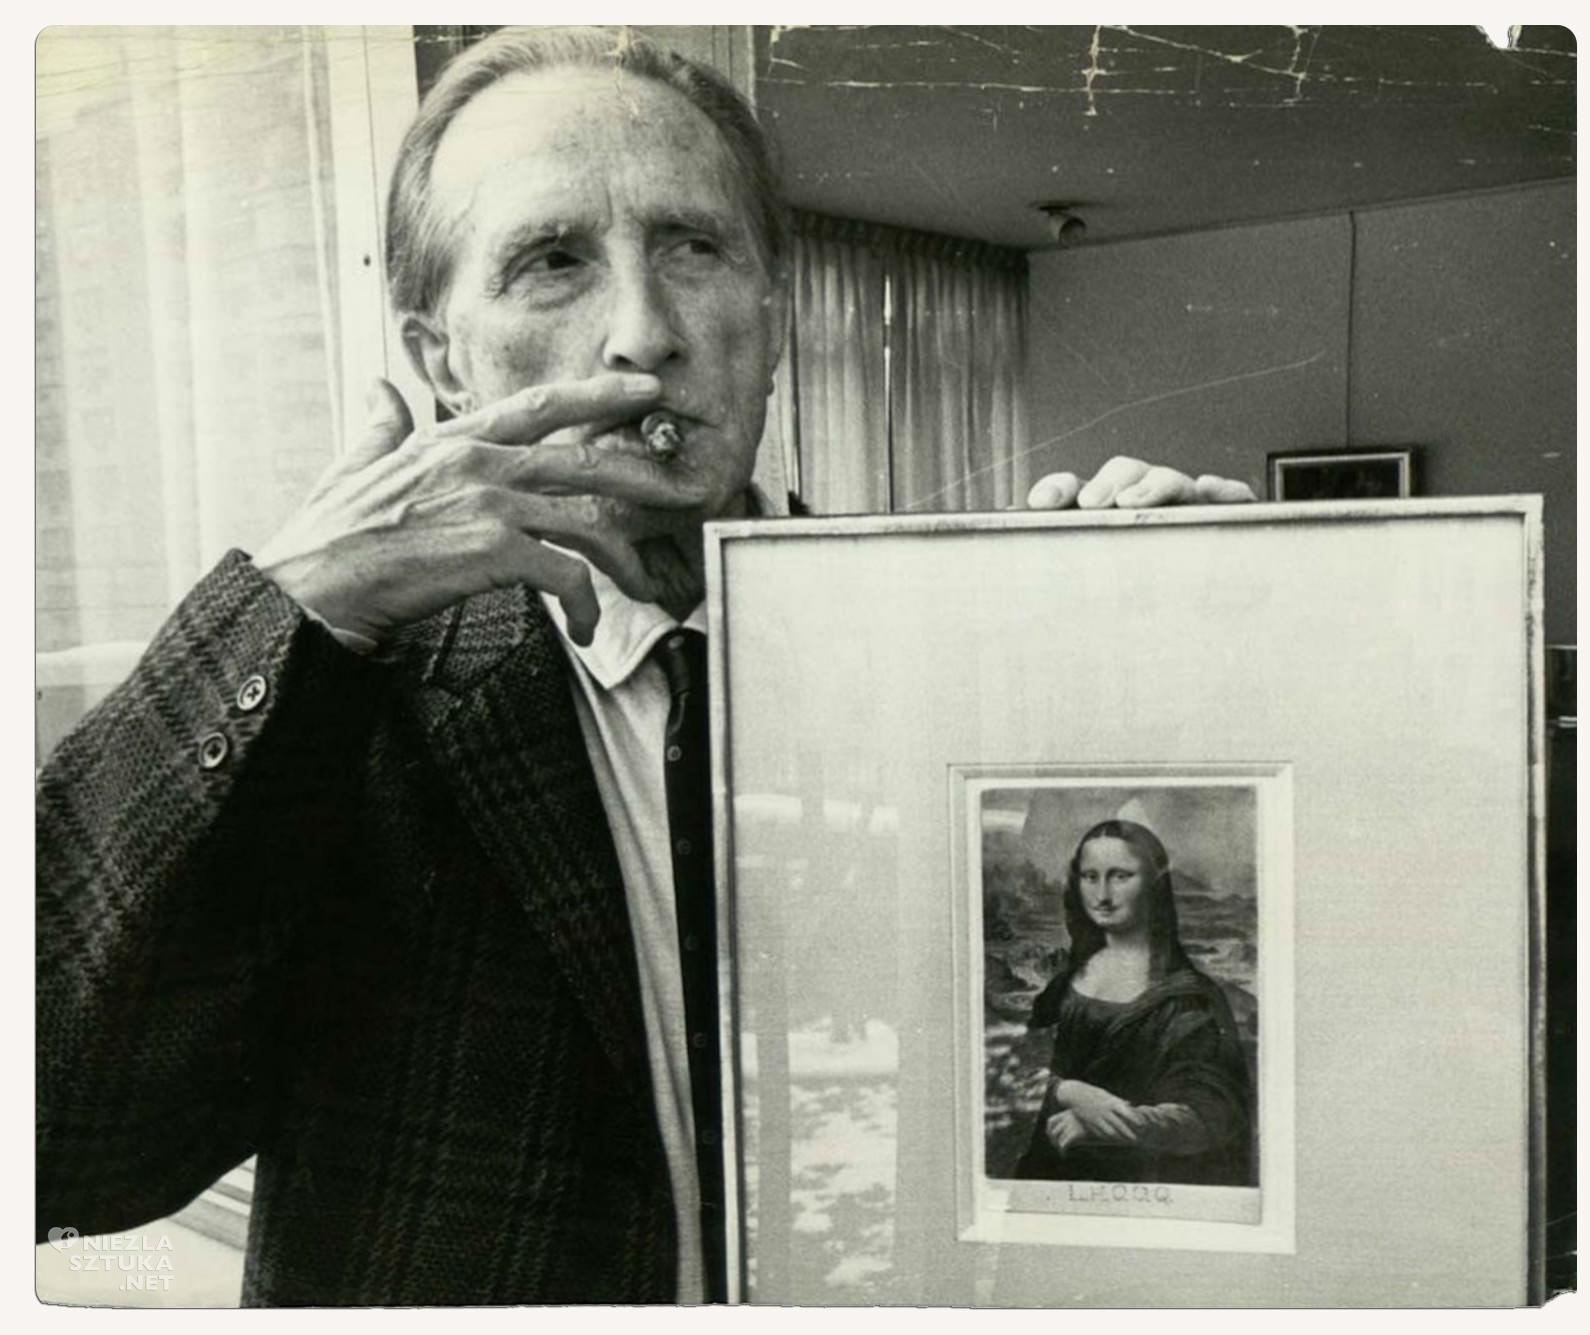 Marcel Duchamp, Mona Lisa LHOOQ, fotografia, Niezła sztuka